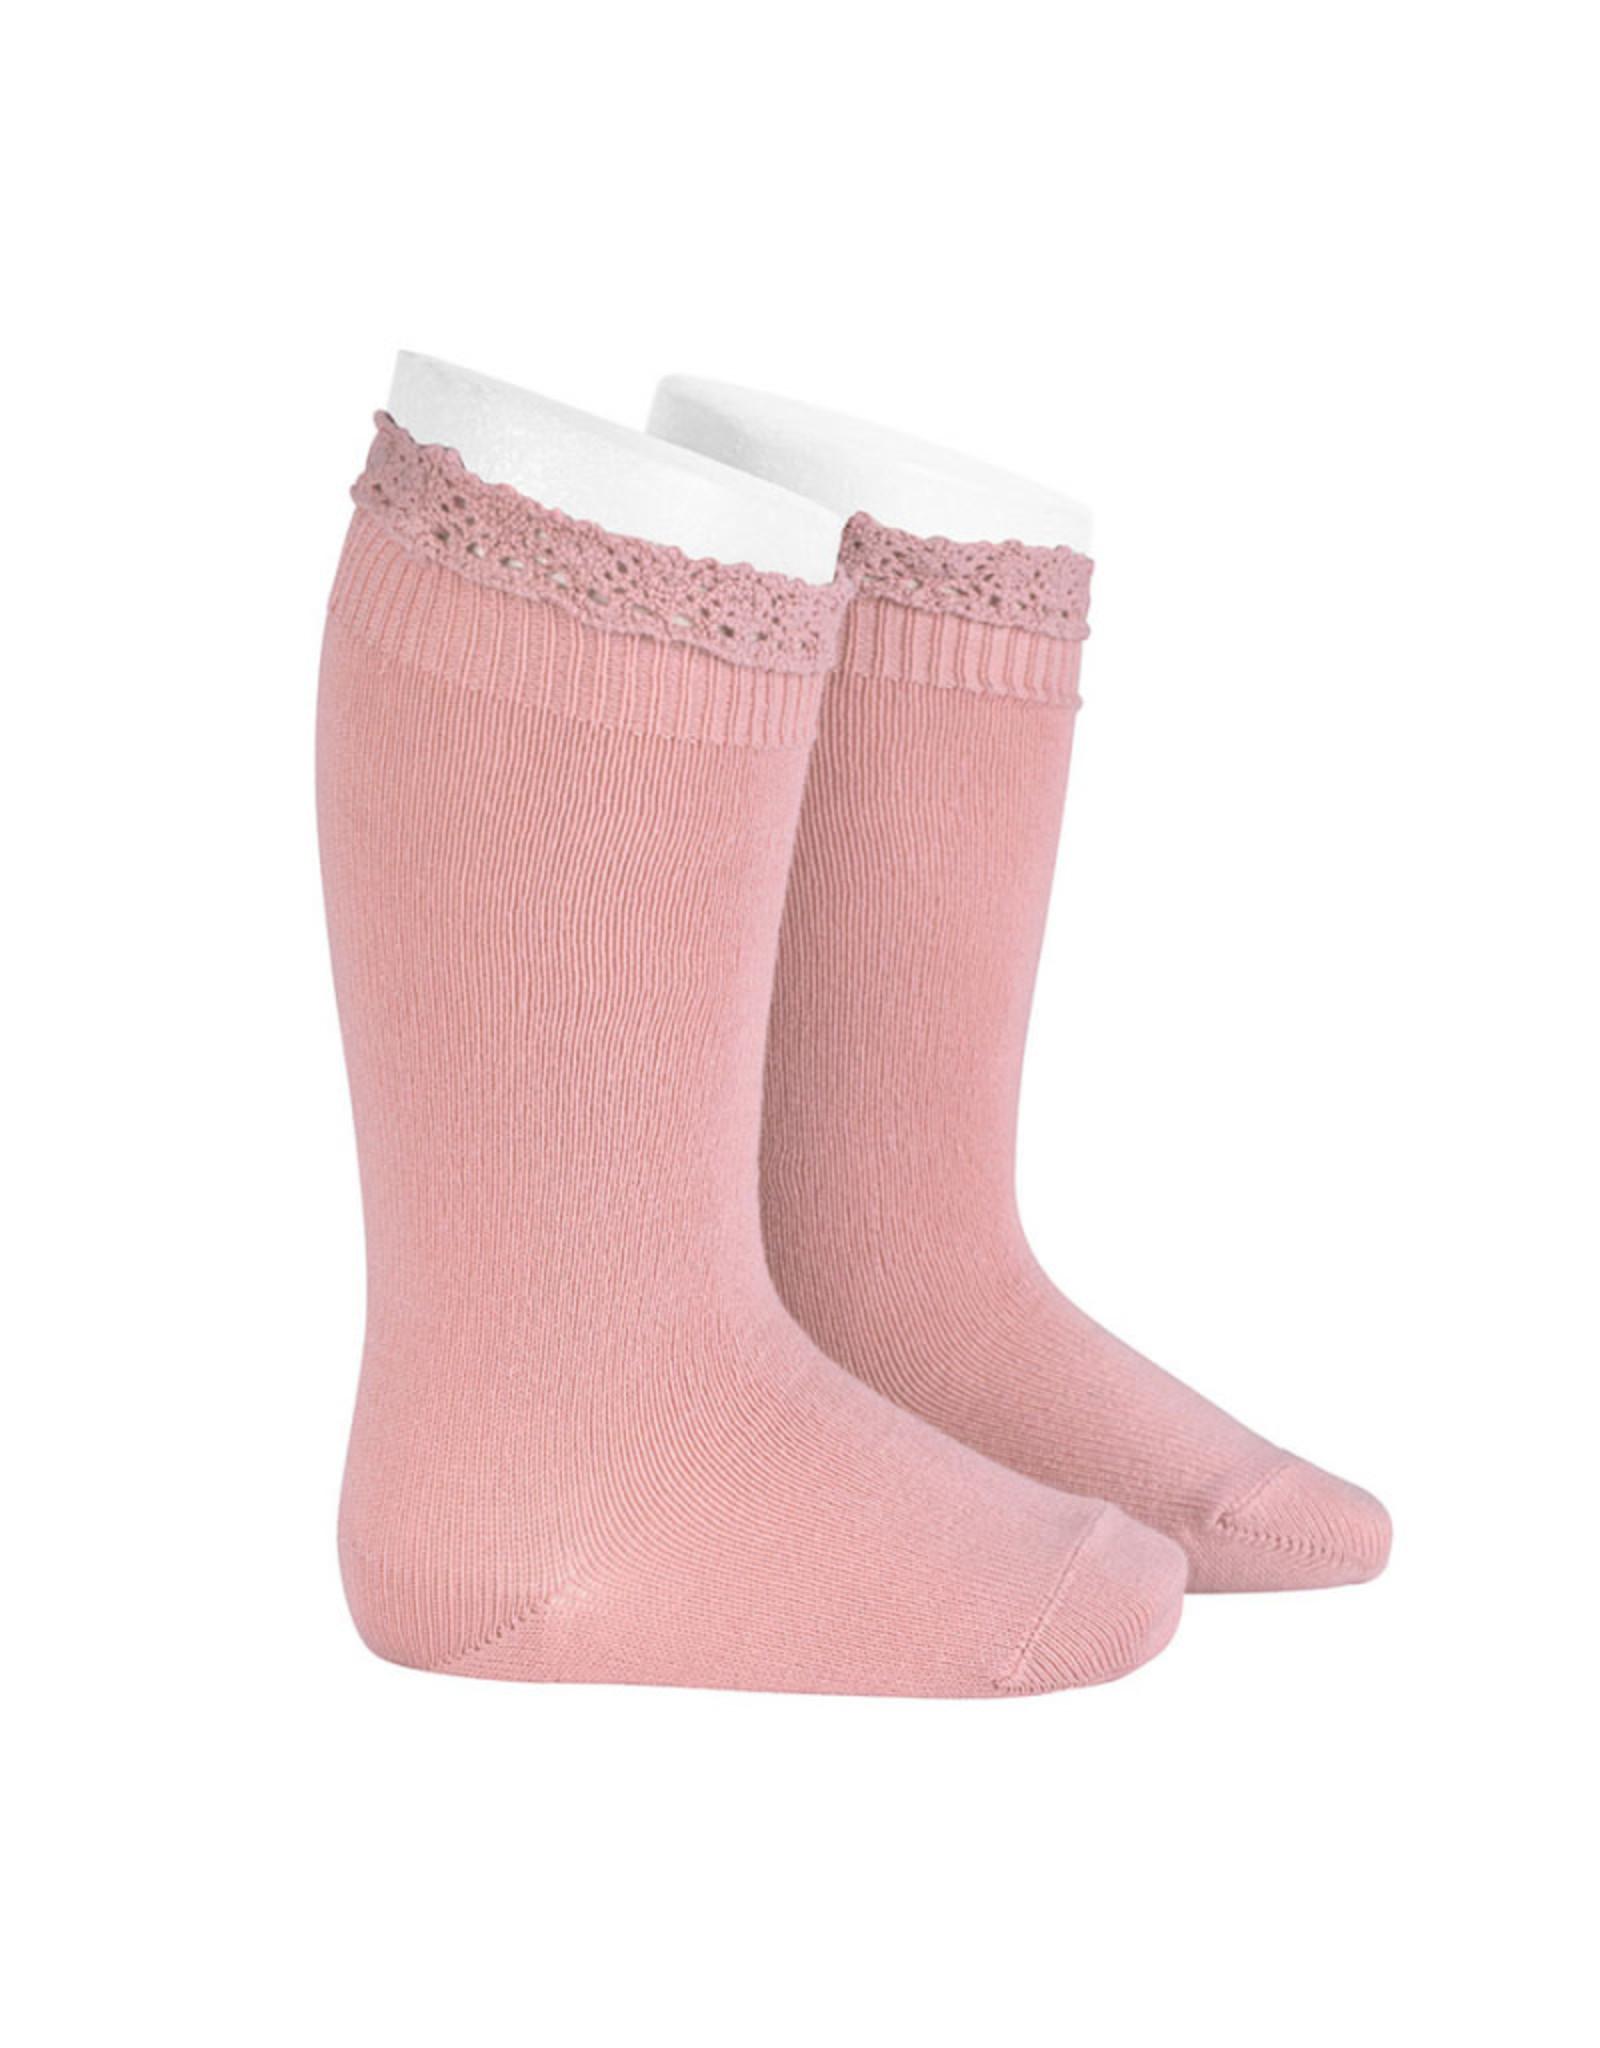 CONDOR Pale Pink Lace Edging Knee Socks